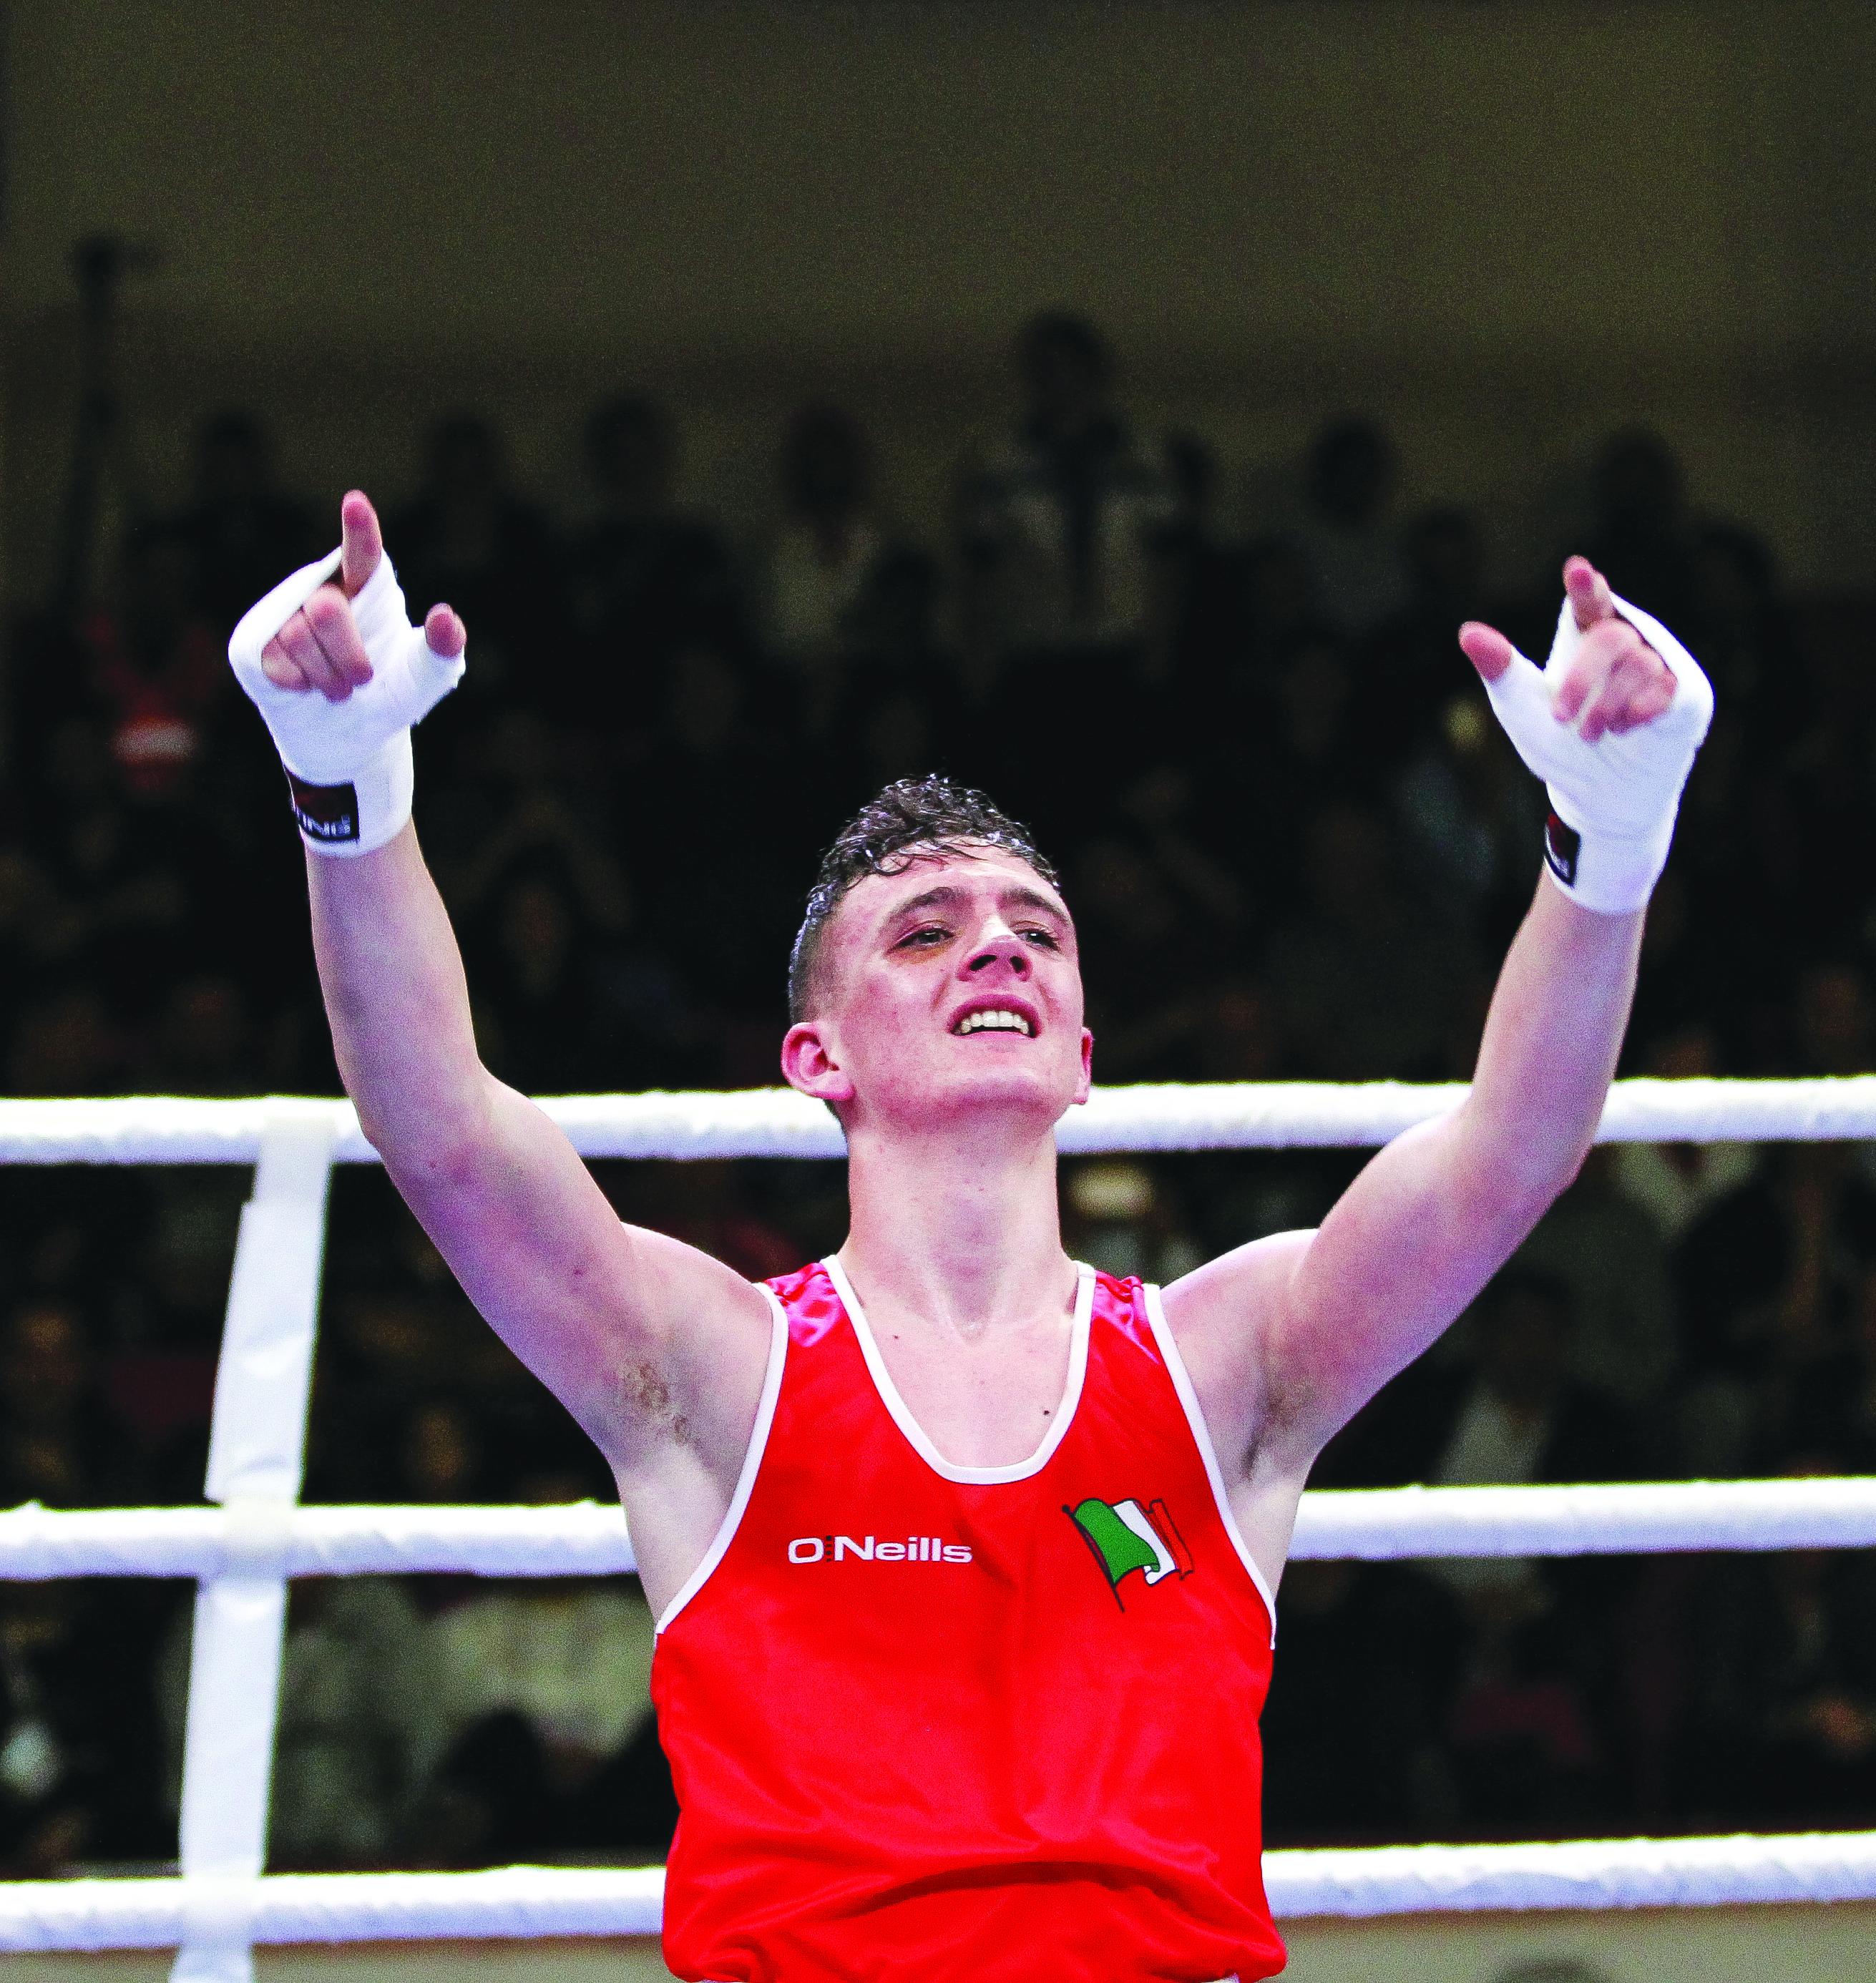 Brendan Irvine was celebrating after Friday's Elite final win in Dublin